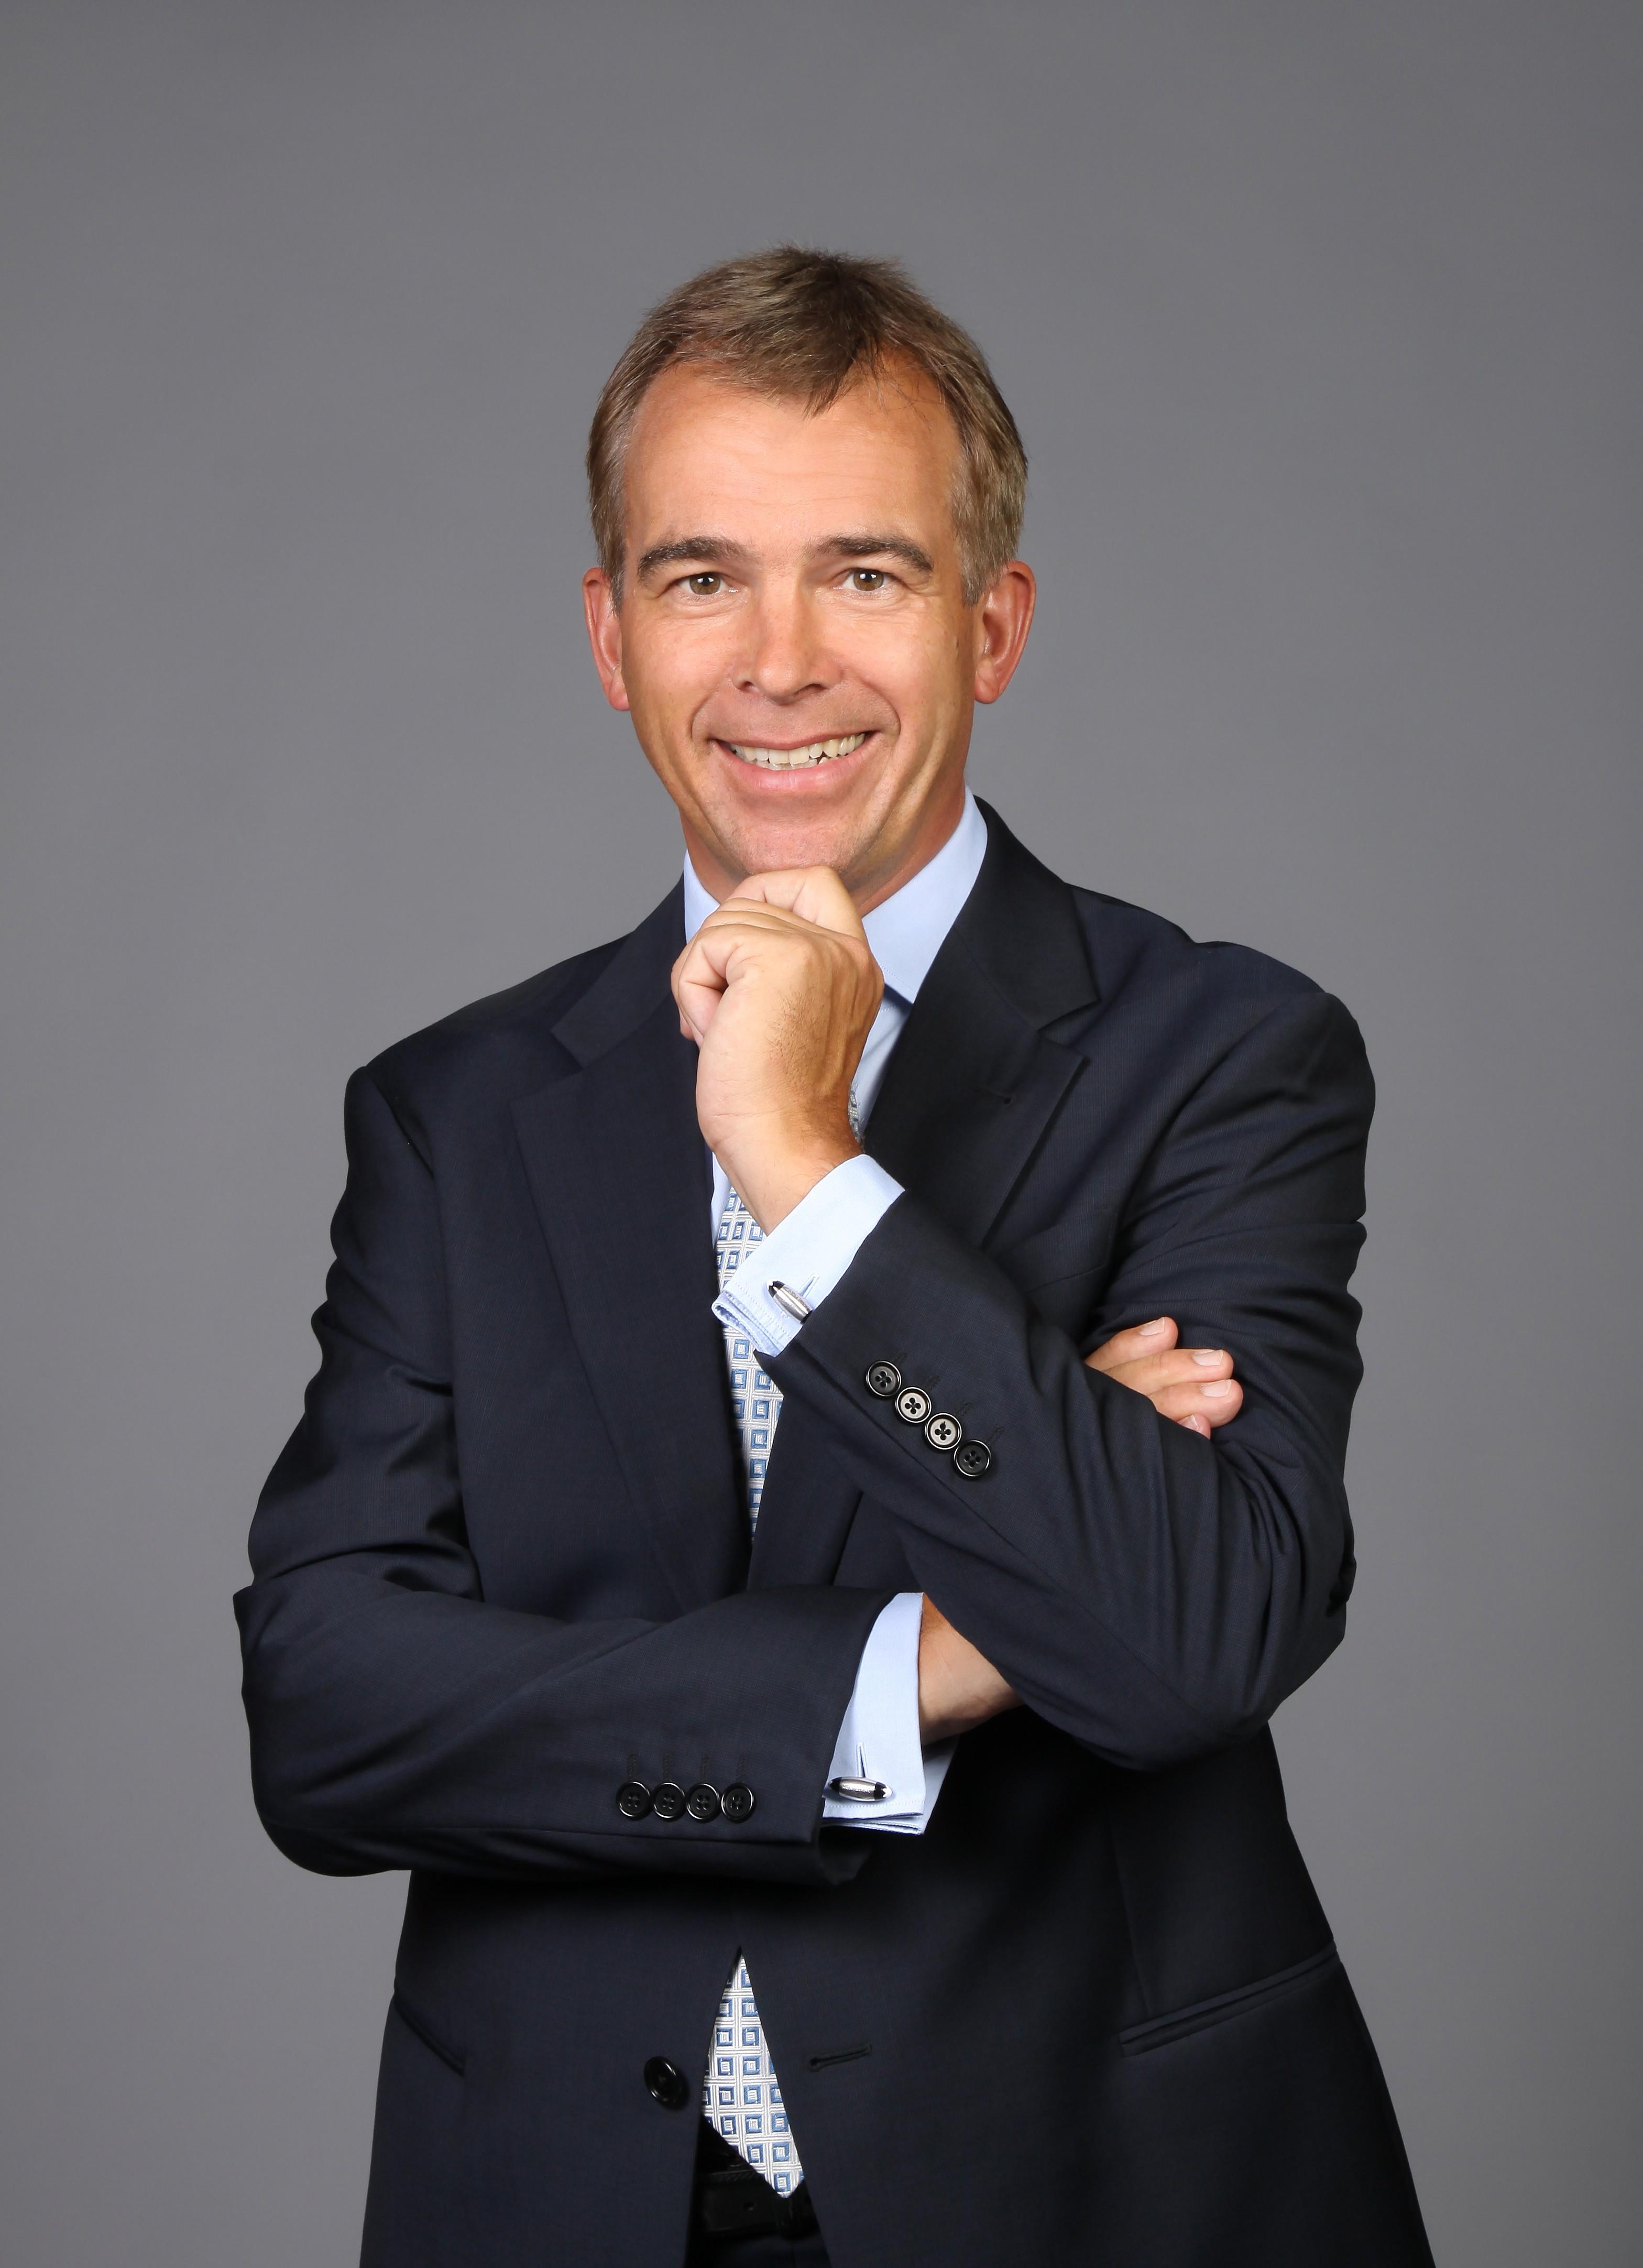 Dr.Michael Effing, Founder & Managing Director, AMAC GmbH